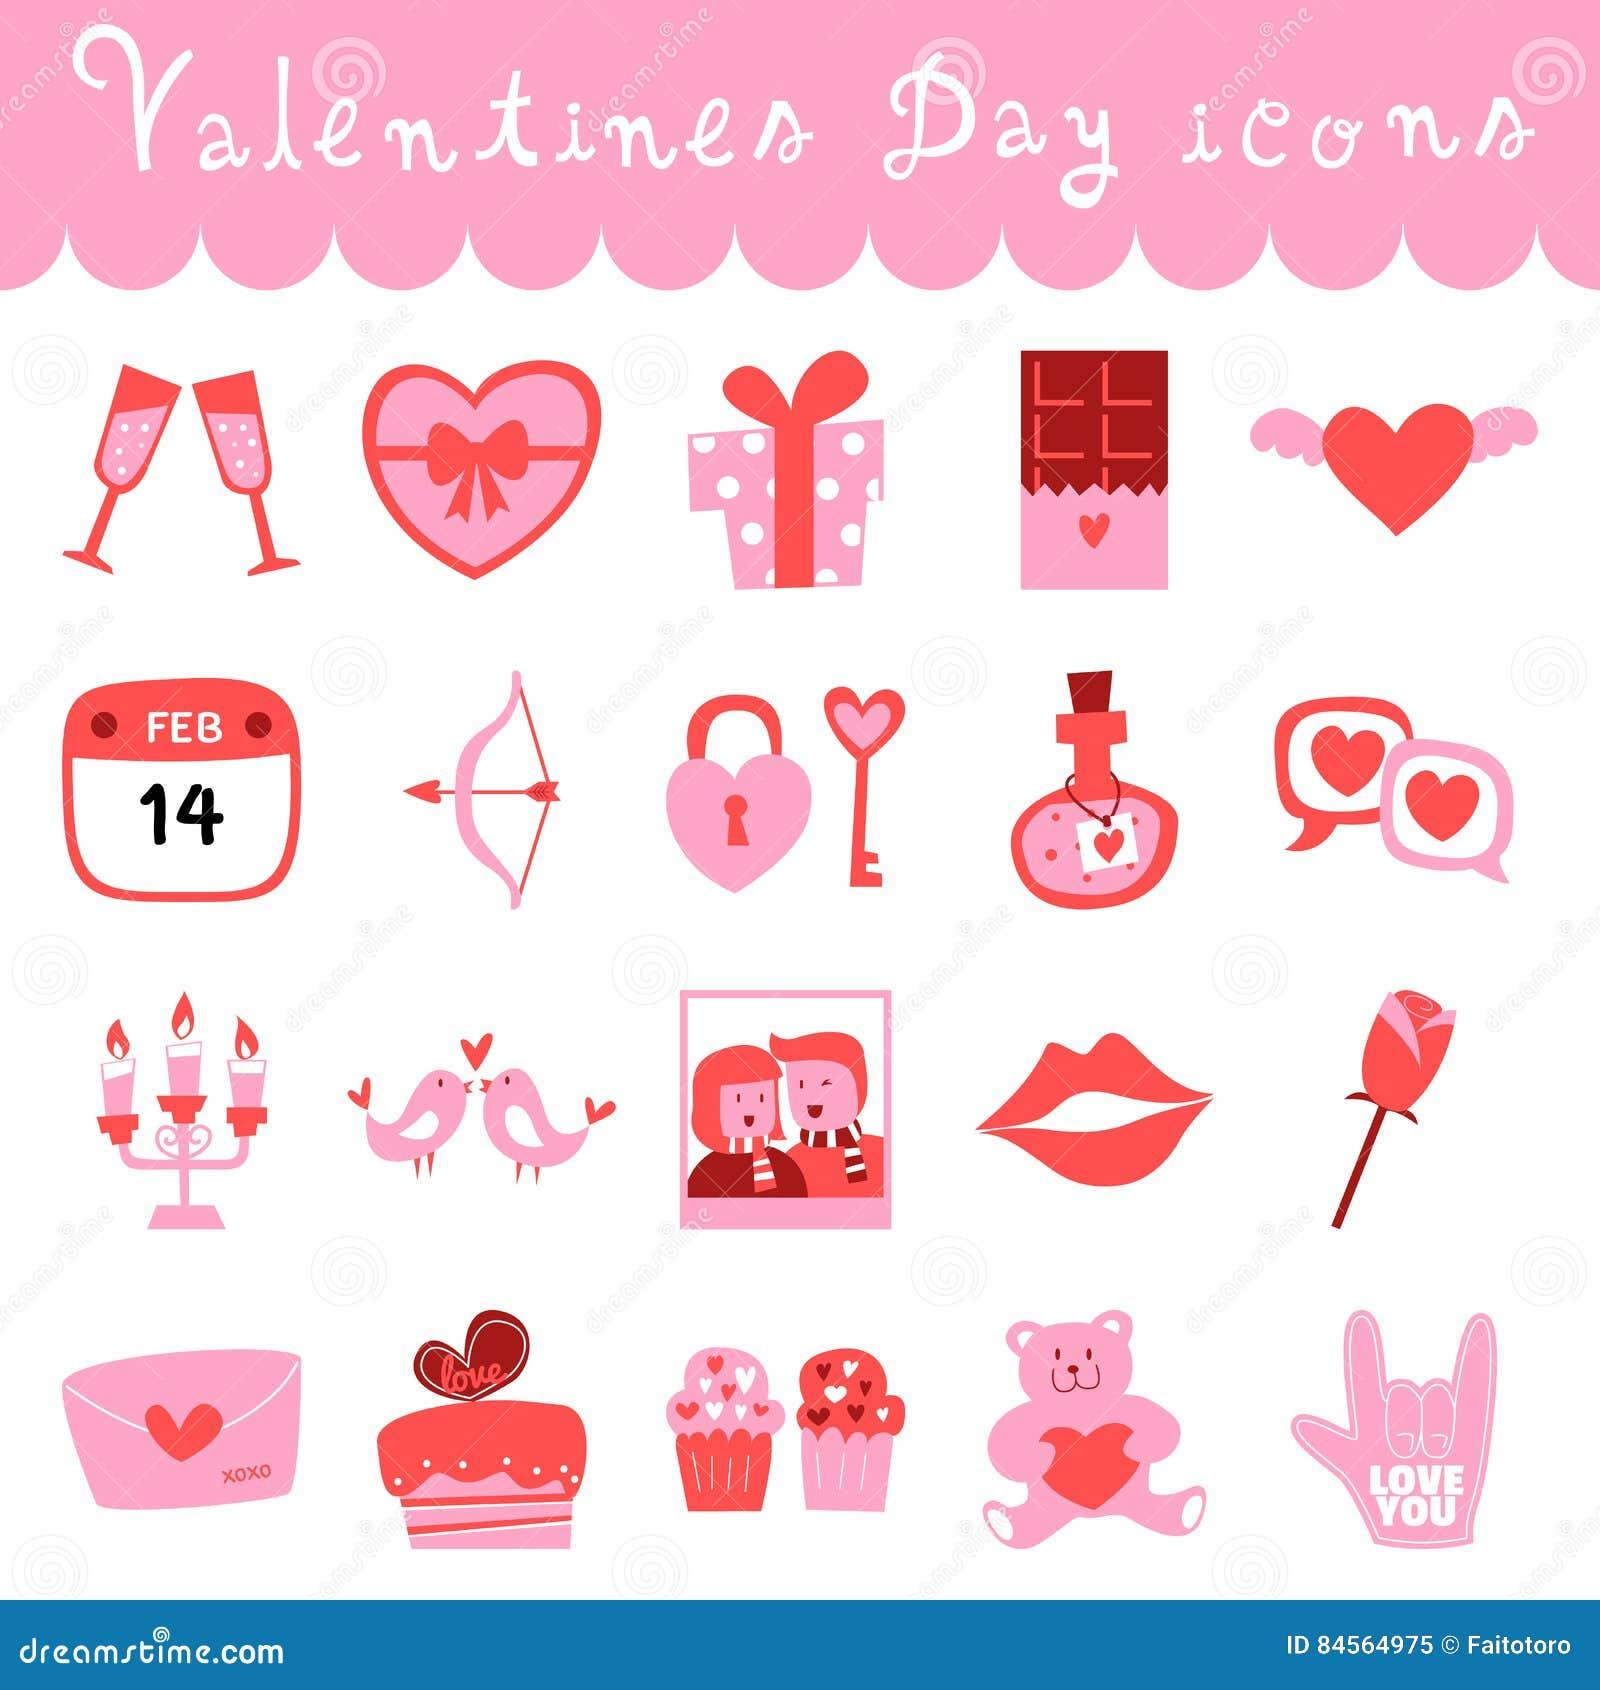 Happy valentines day doodle icons